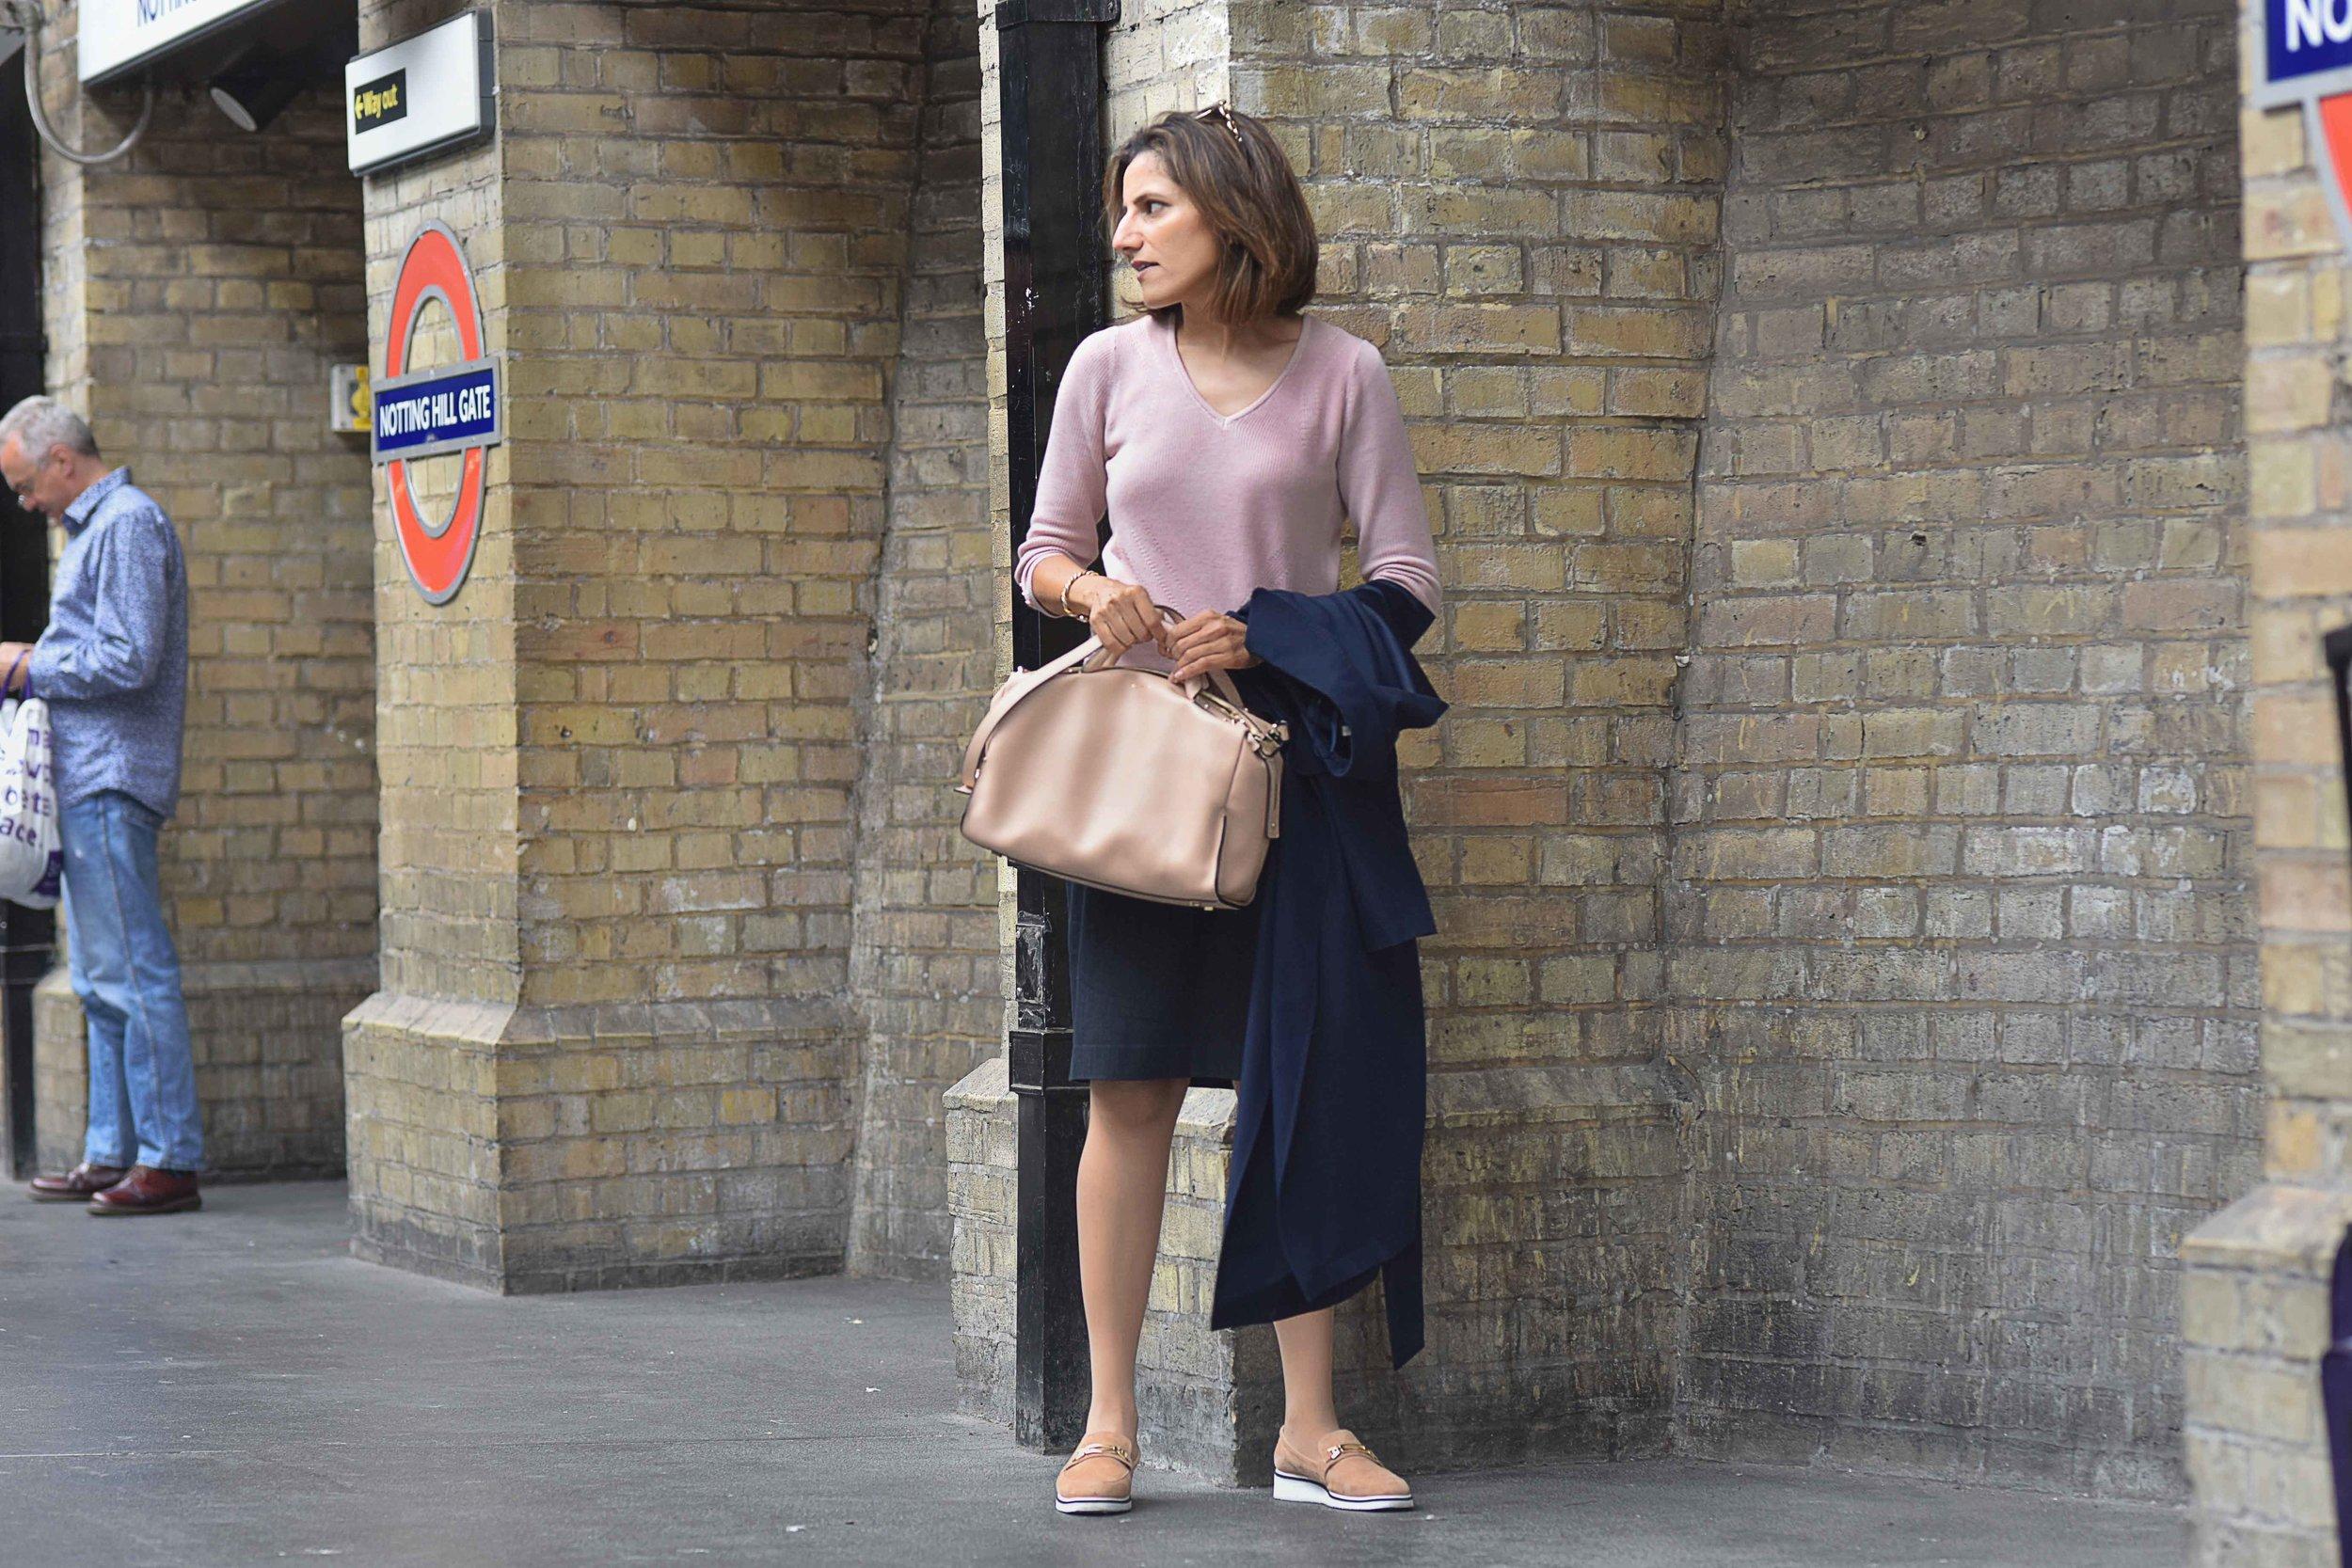 Street style, fashion, London, Notting Hill. Image©thingstodot.com